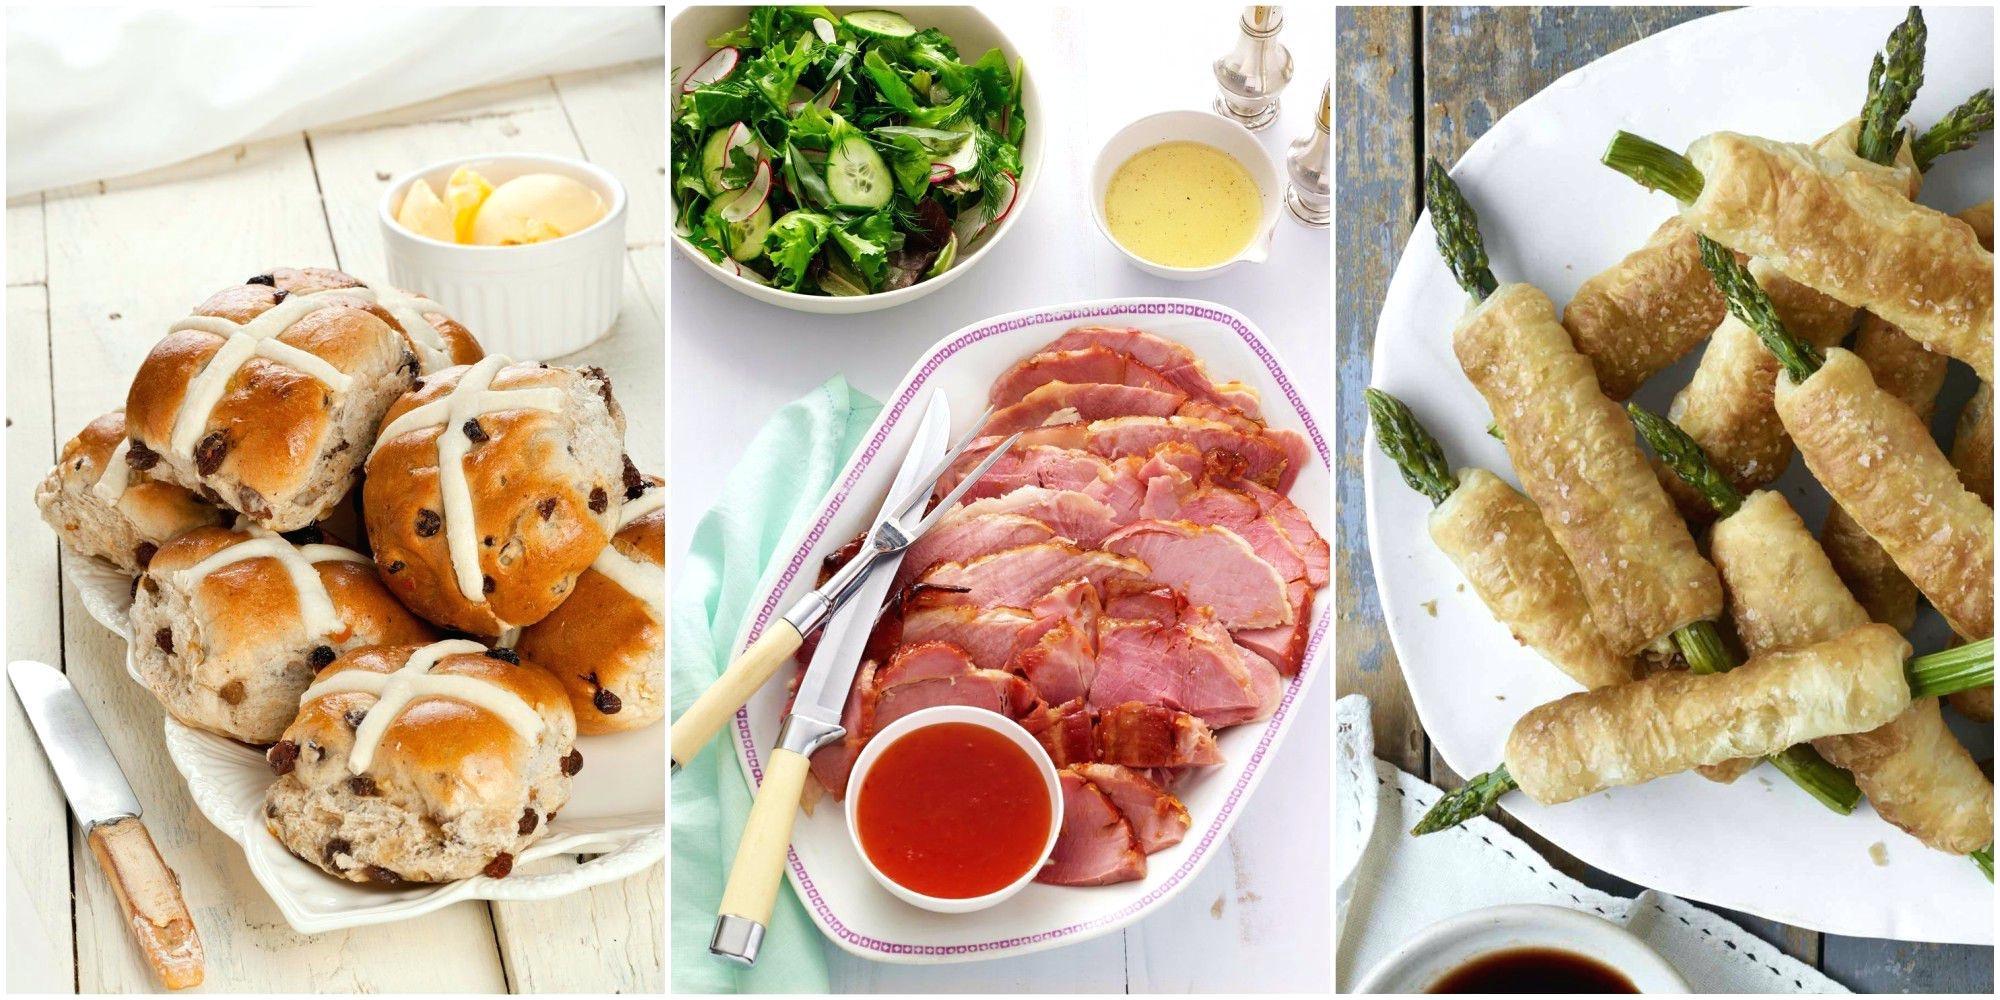 Easter Dinner Ideas No Ham  easter dinner ideas no ham – starifo